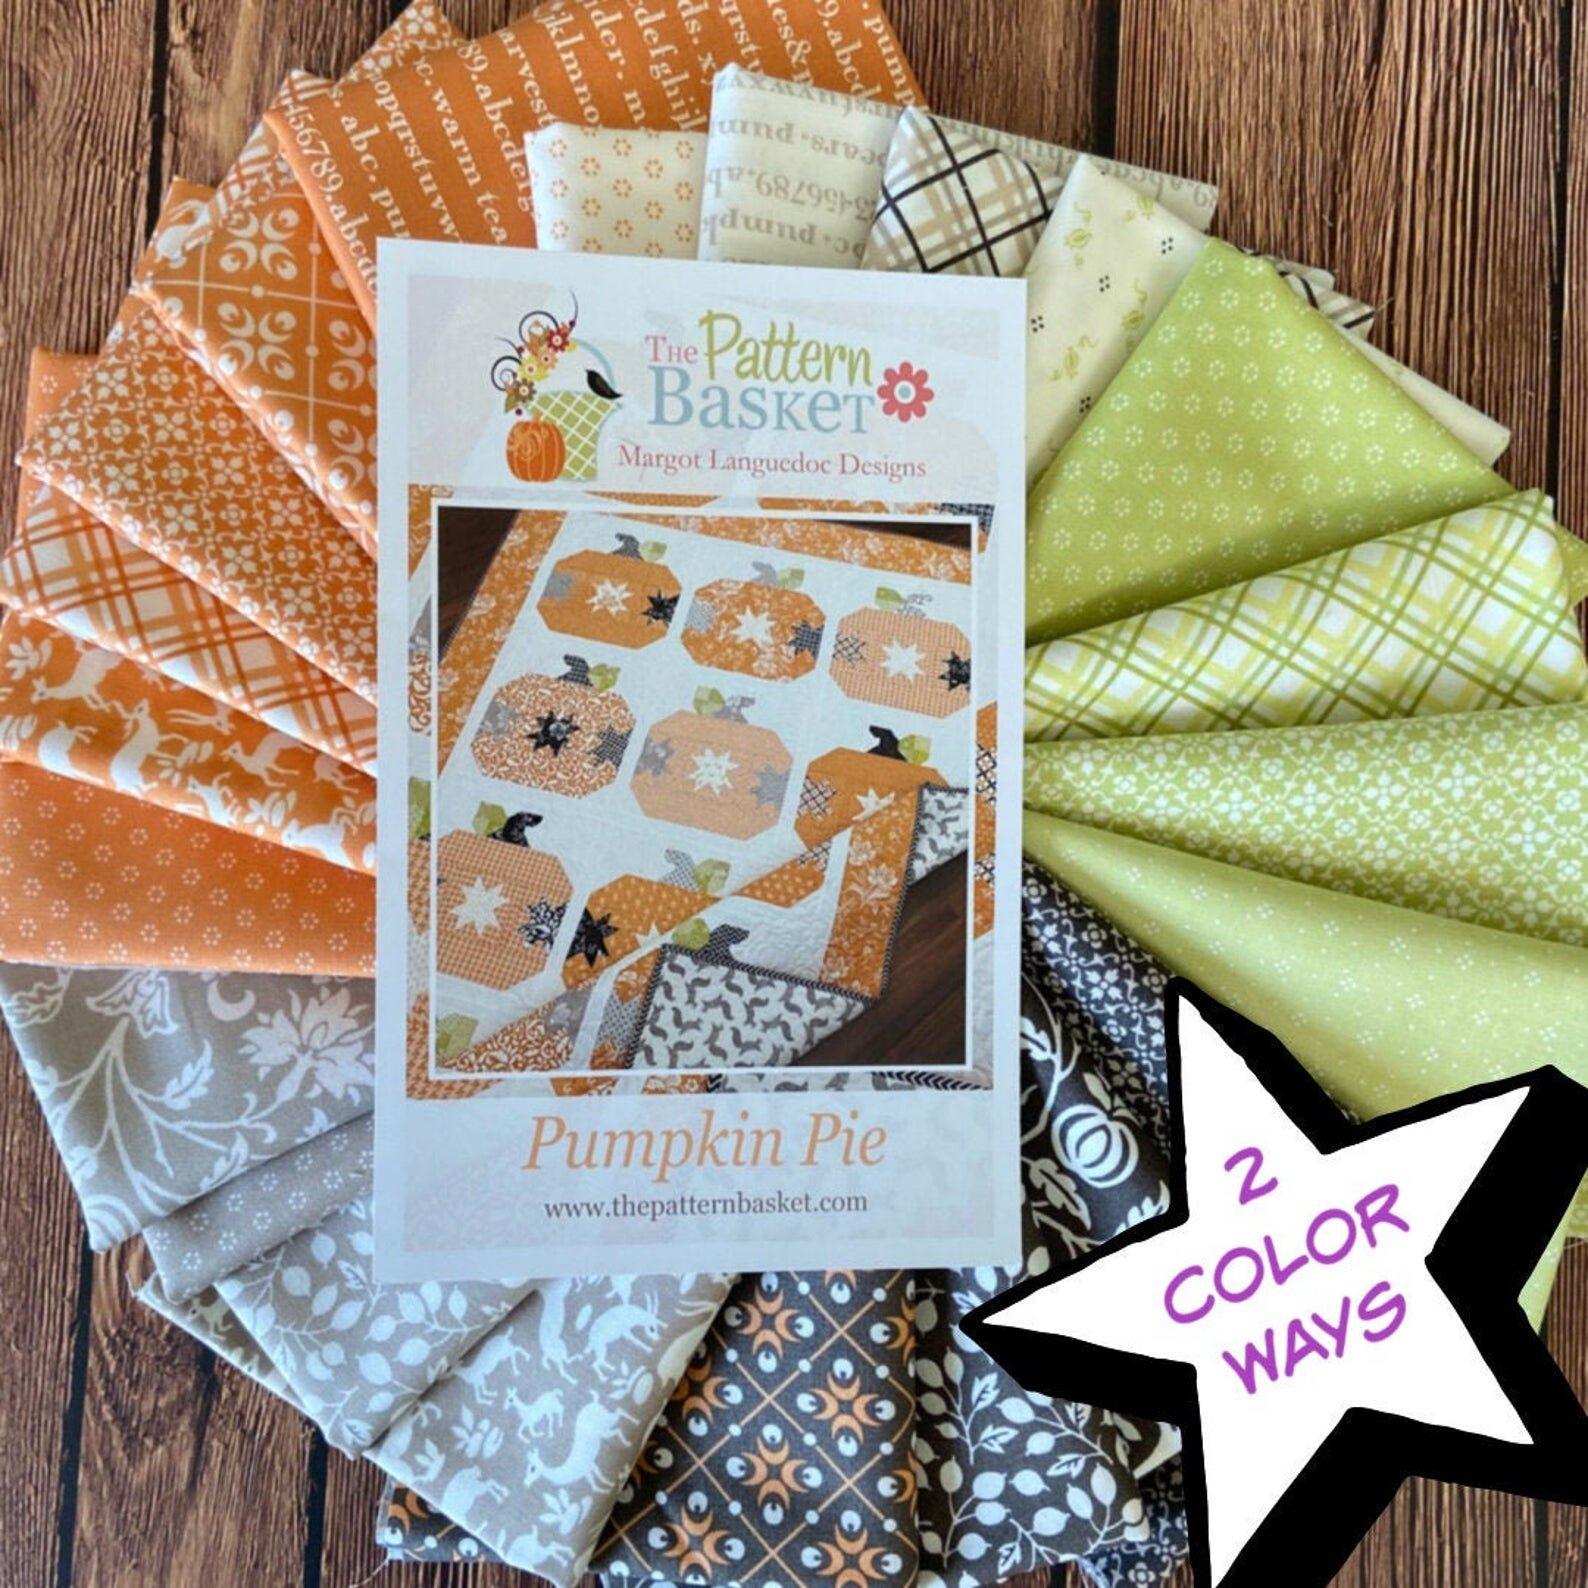 Pumpkin Pie Quilt Kit featuring The Pattern Basket